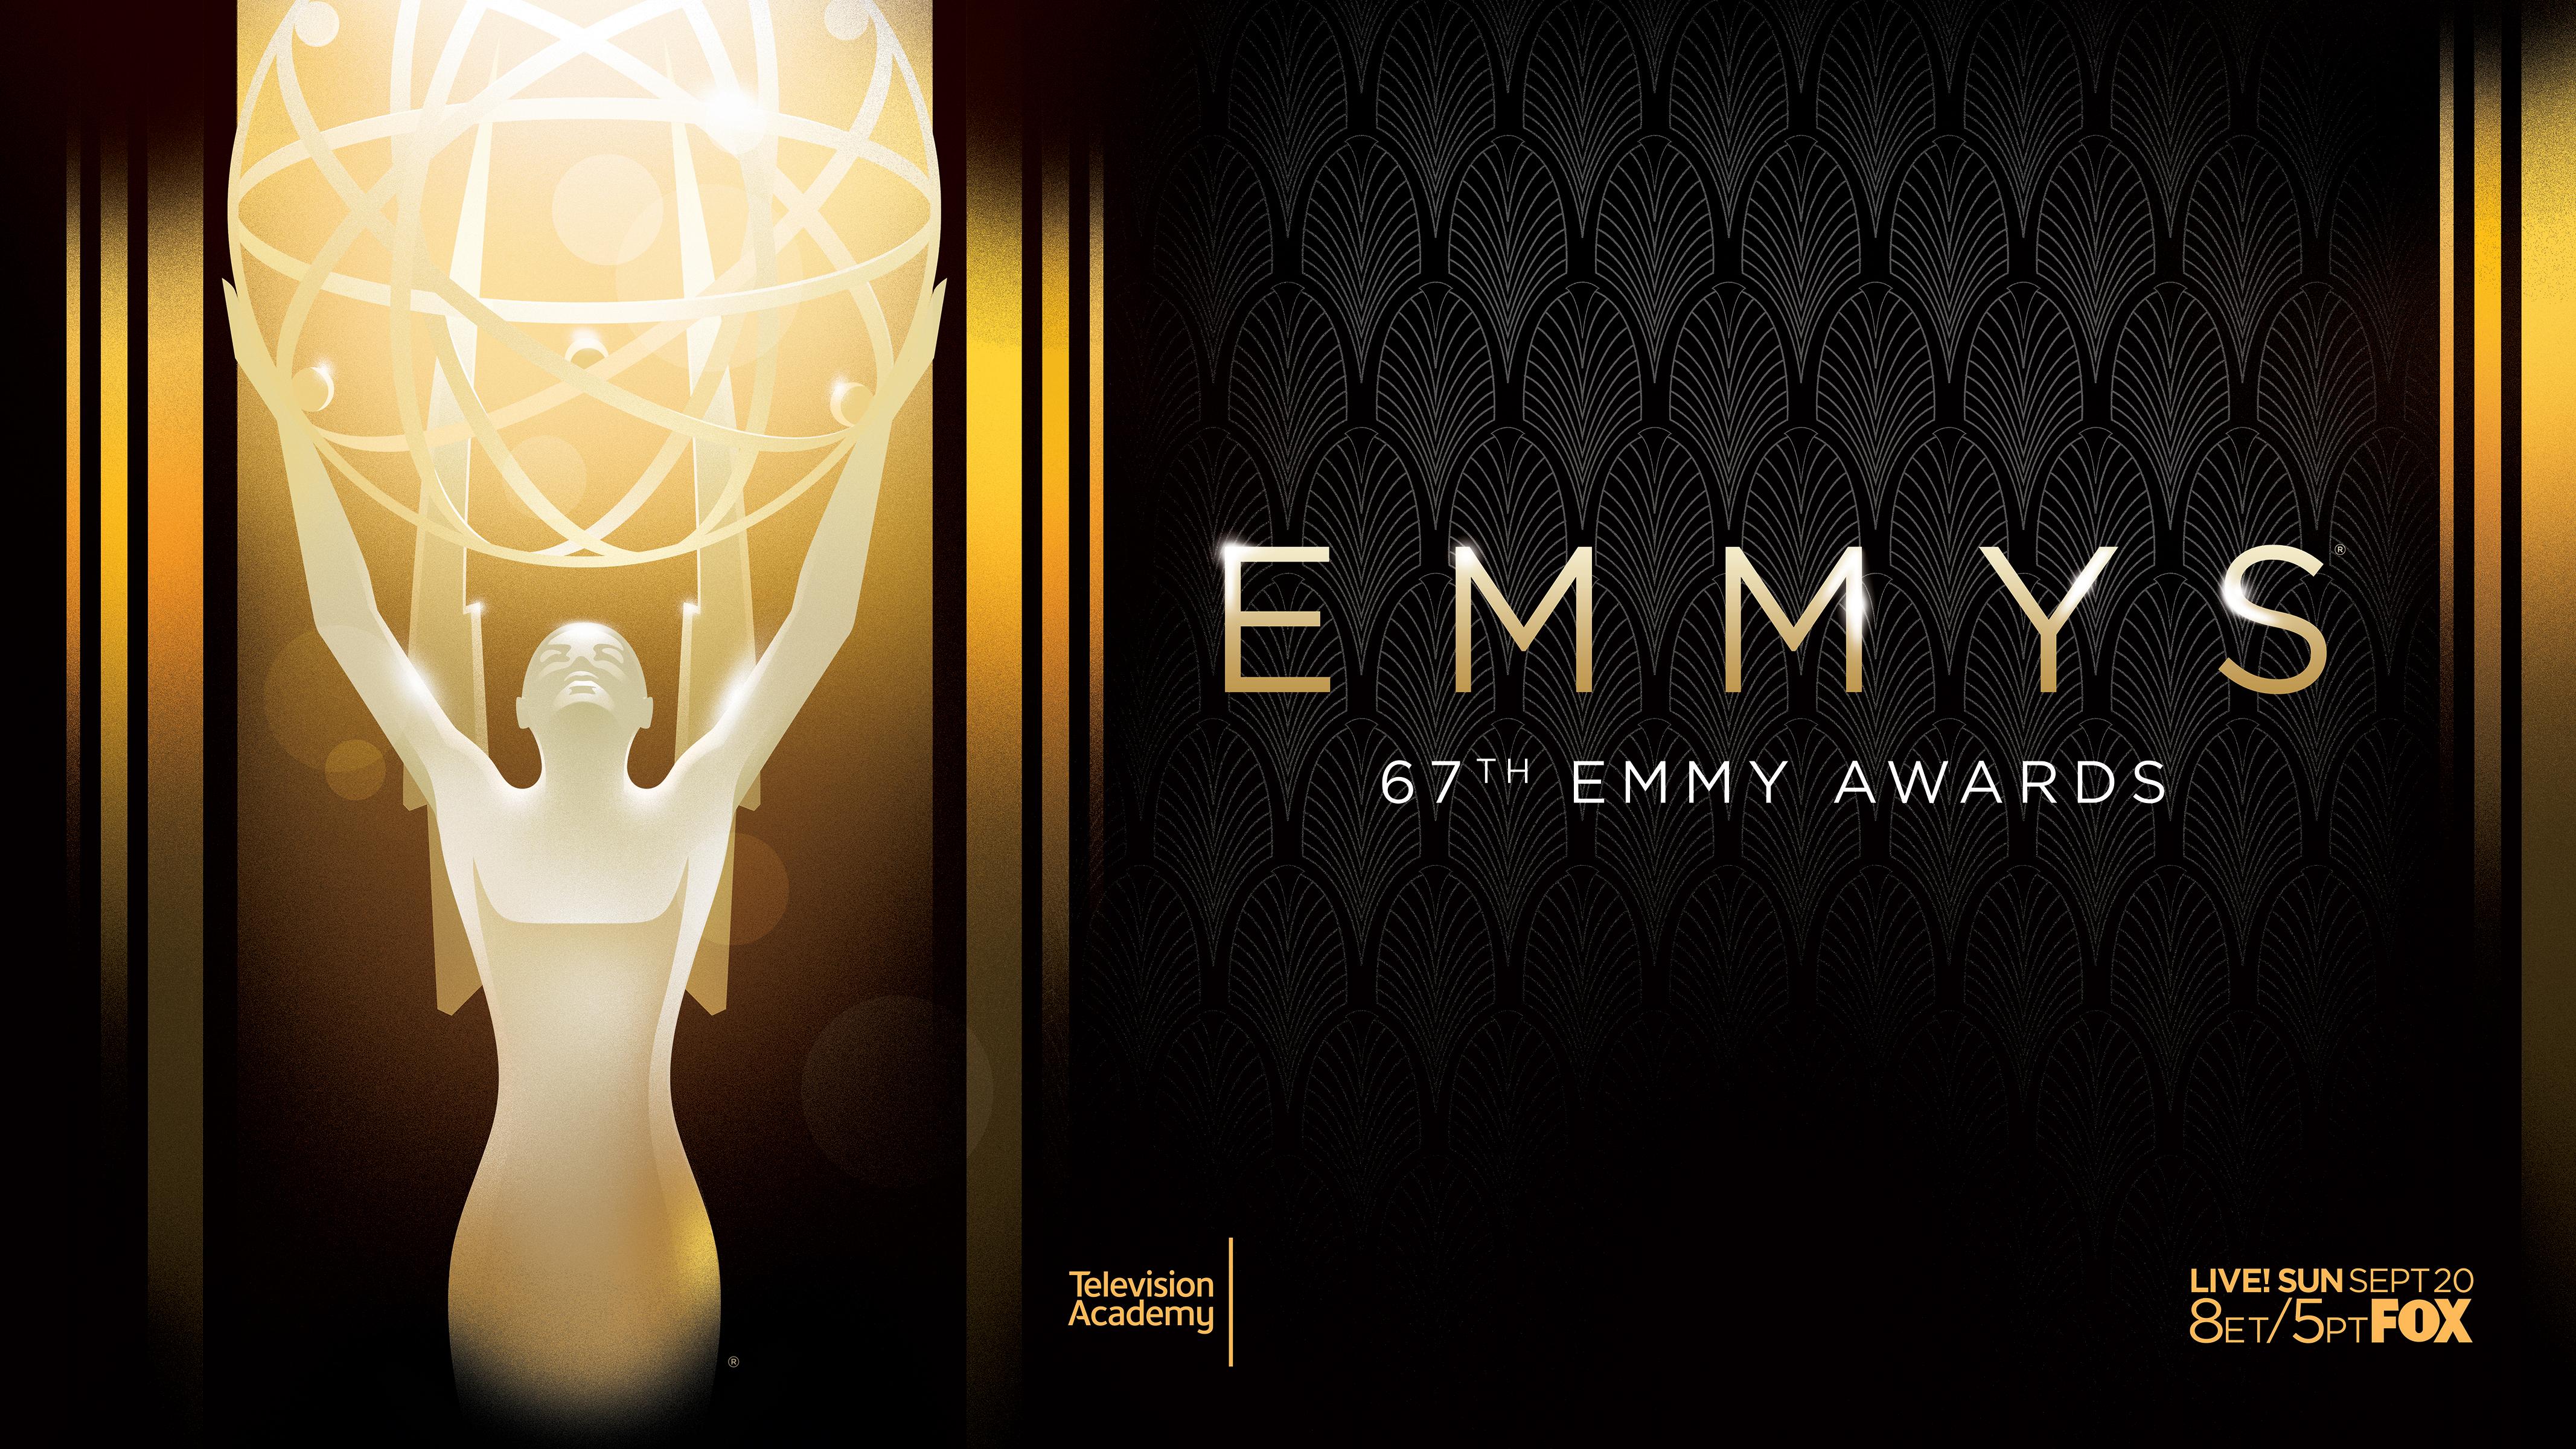 67th PRIMETIME EMMY AWARDS: VINCITORI. TRIONFA HBO TRA IL TRONO DI SPADE E OLIVE KITTERIDGE